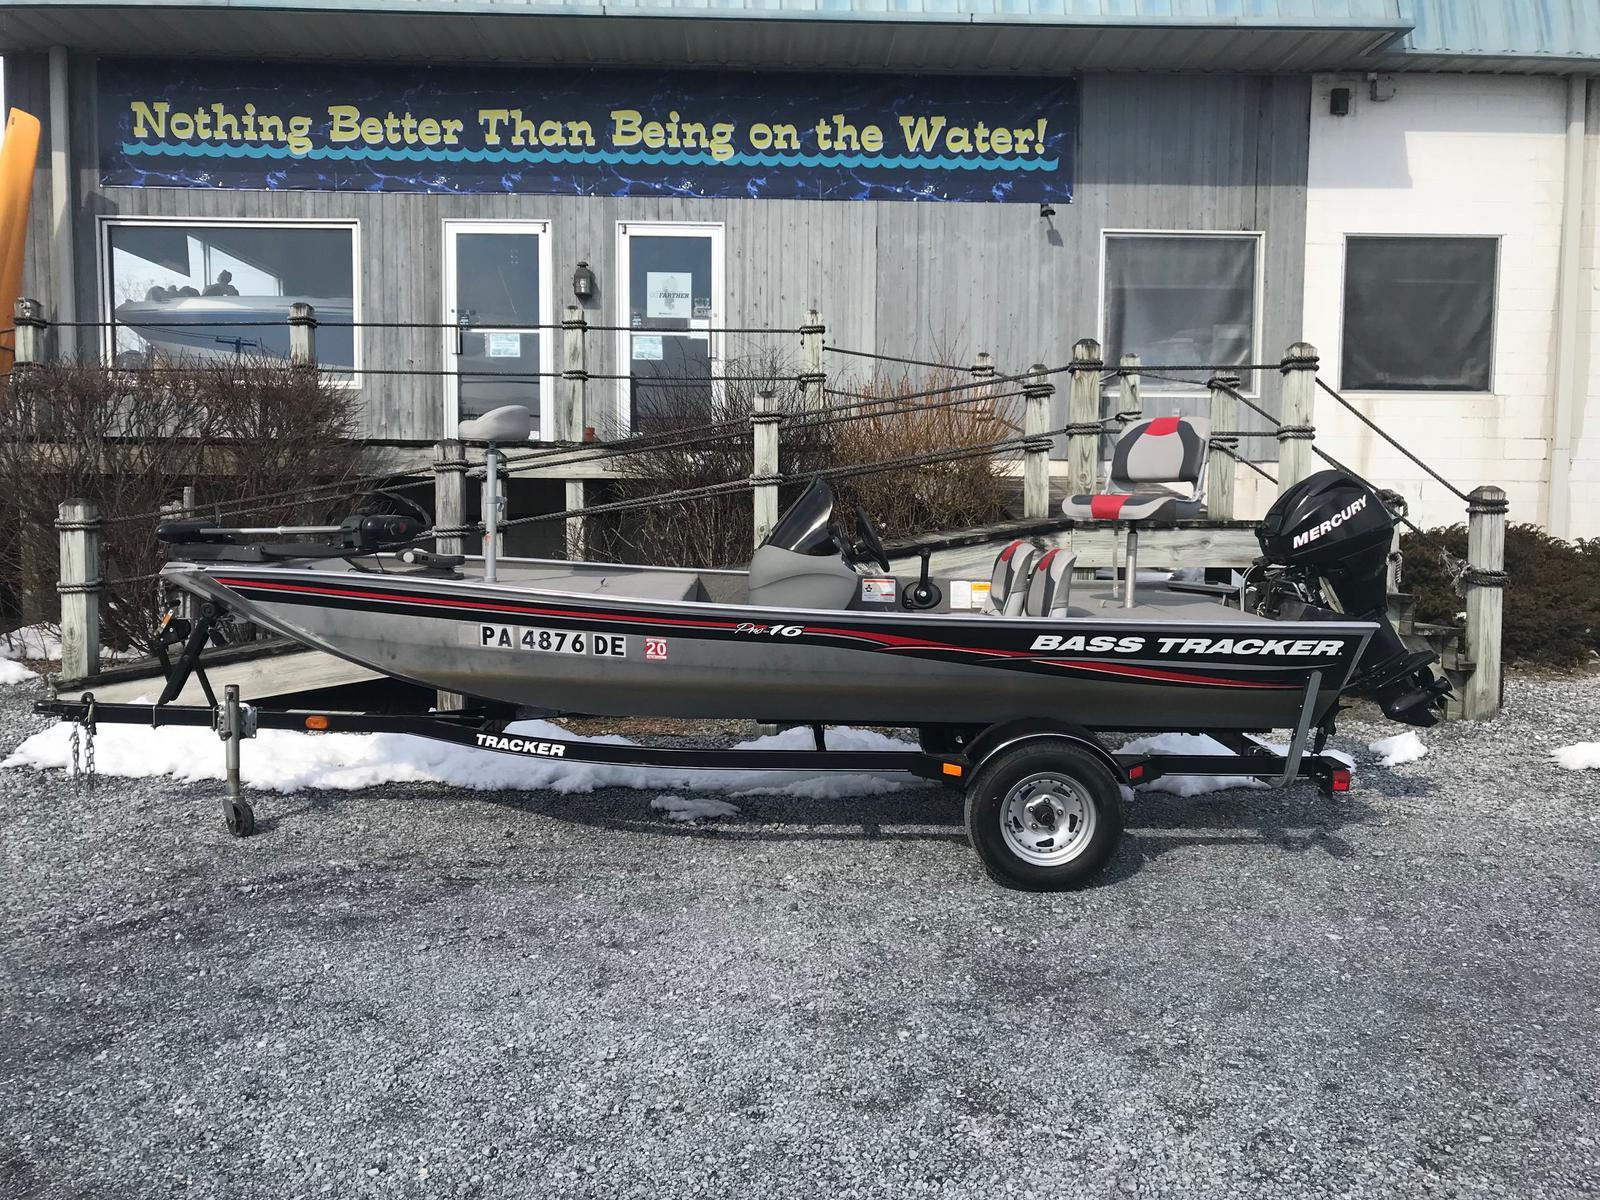 Tracker Basstracker Pro 16 for sale in Ephrata, PA